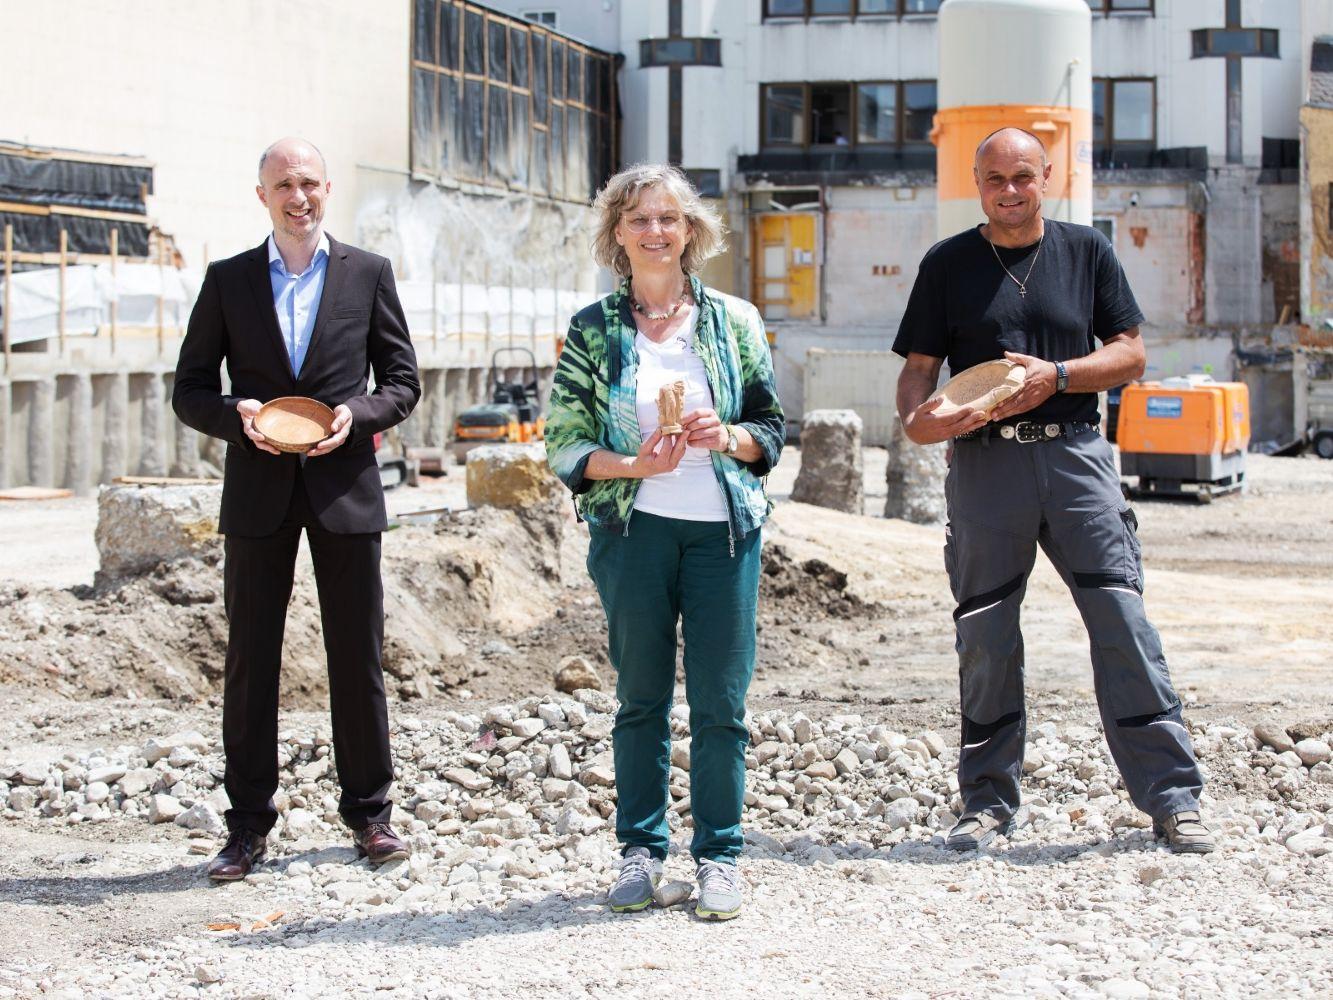 Dr. Wiener-Fererhofer, Filialdirektor der VKB-Bank Wels, Dr. Renate Miglbauer vom Stadtmuseum Wels und Archäologe Wolfgang Klimesch (vlnr)